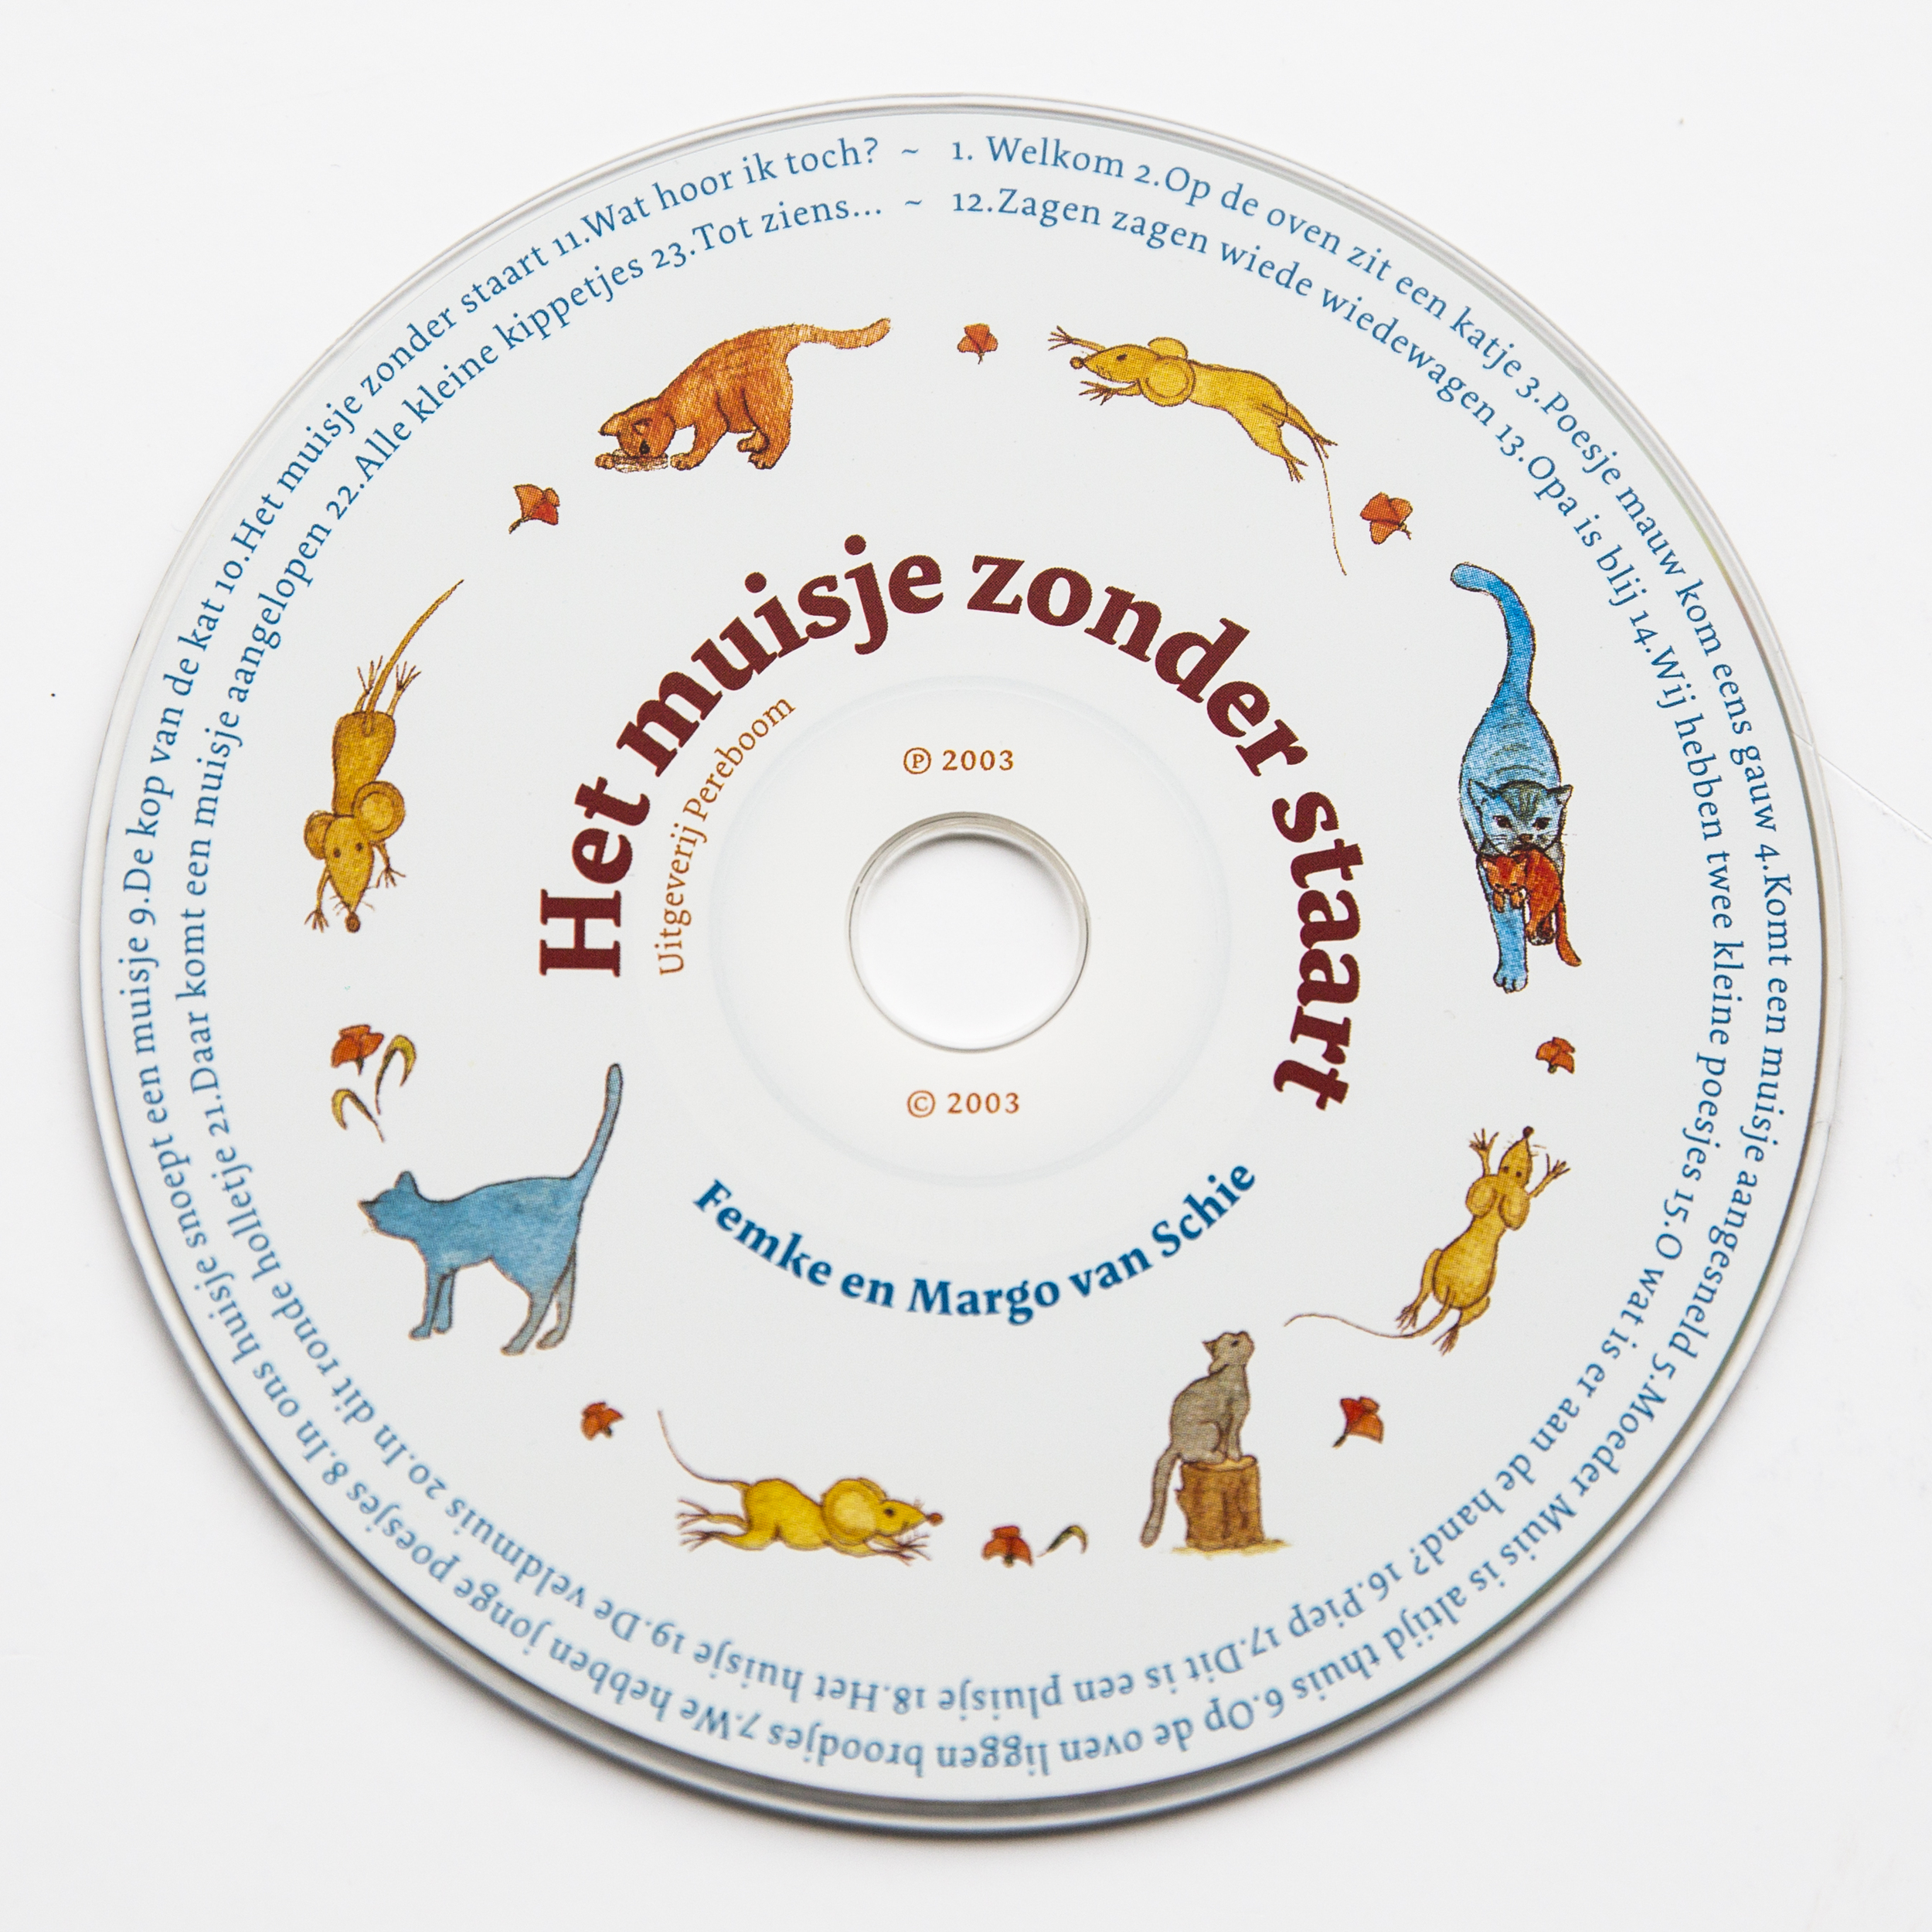 Muisjezonderstaart-CD_79A8825.jpg